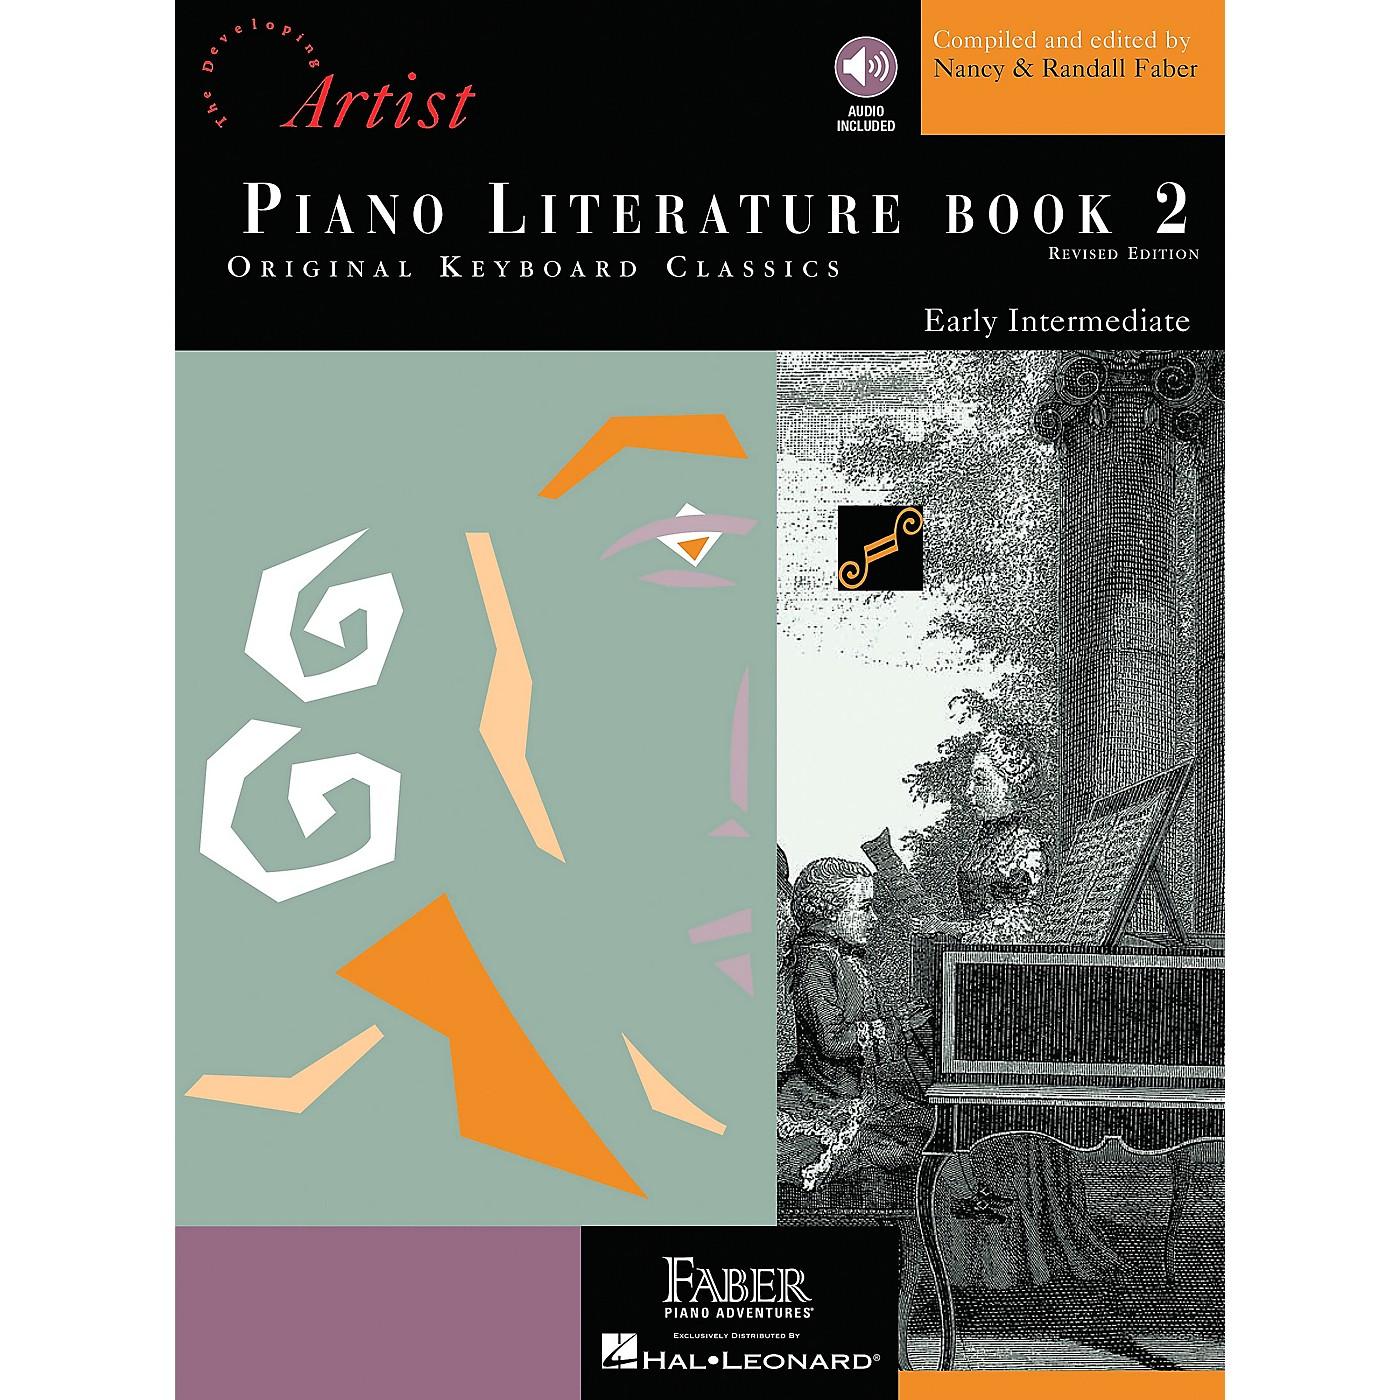 Faber Piano Adventures Piano Literature Book 2 - Developing Artist Original Keyboard Classics Book/CD - Faber Piano thumbnail